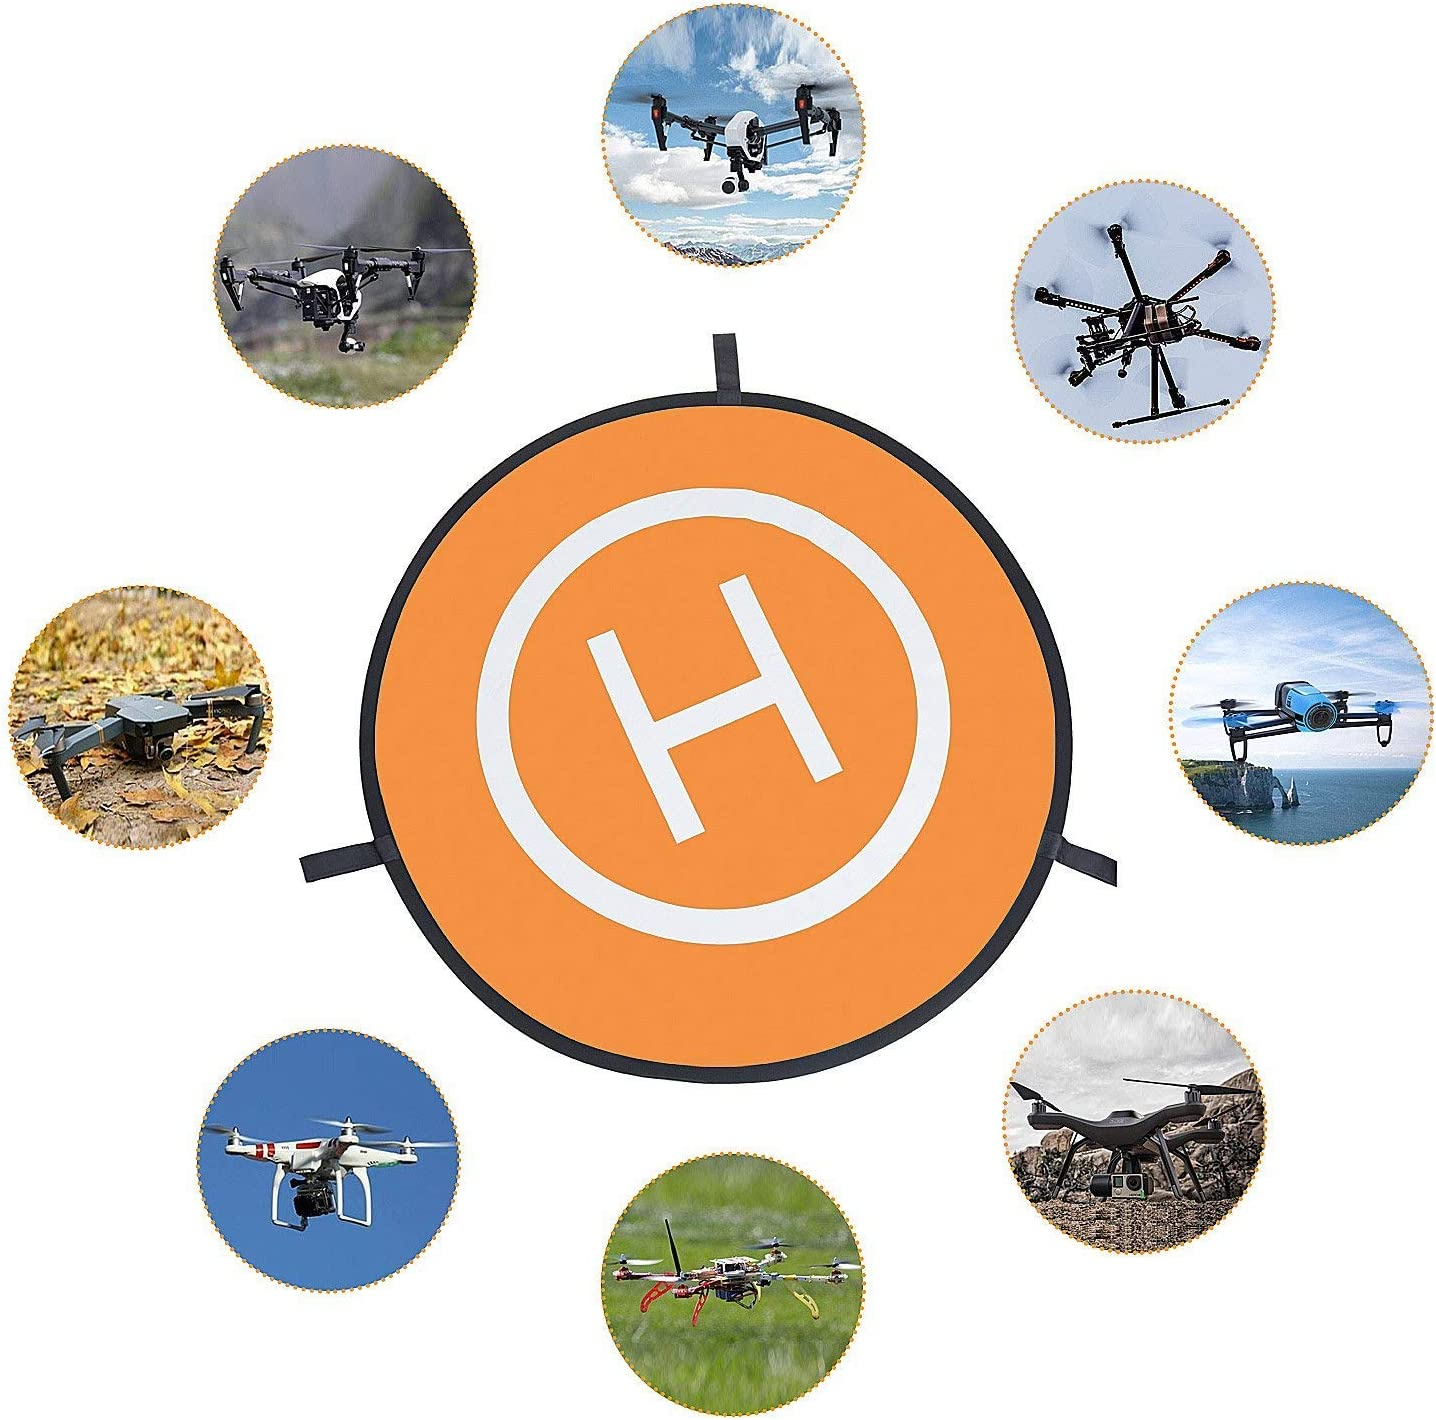 22//55cm Waterproof Portable Foldable Helipad Helicopter Landig Mat for DJI Mavic Pro Phantom 2//3//4// Pro DJI Mavic Air Drone Landing Pad RC Drones Helicopter Inspire and More Karma Drone